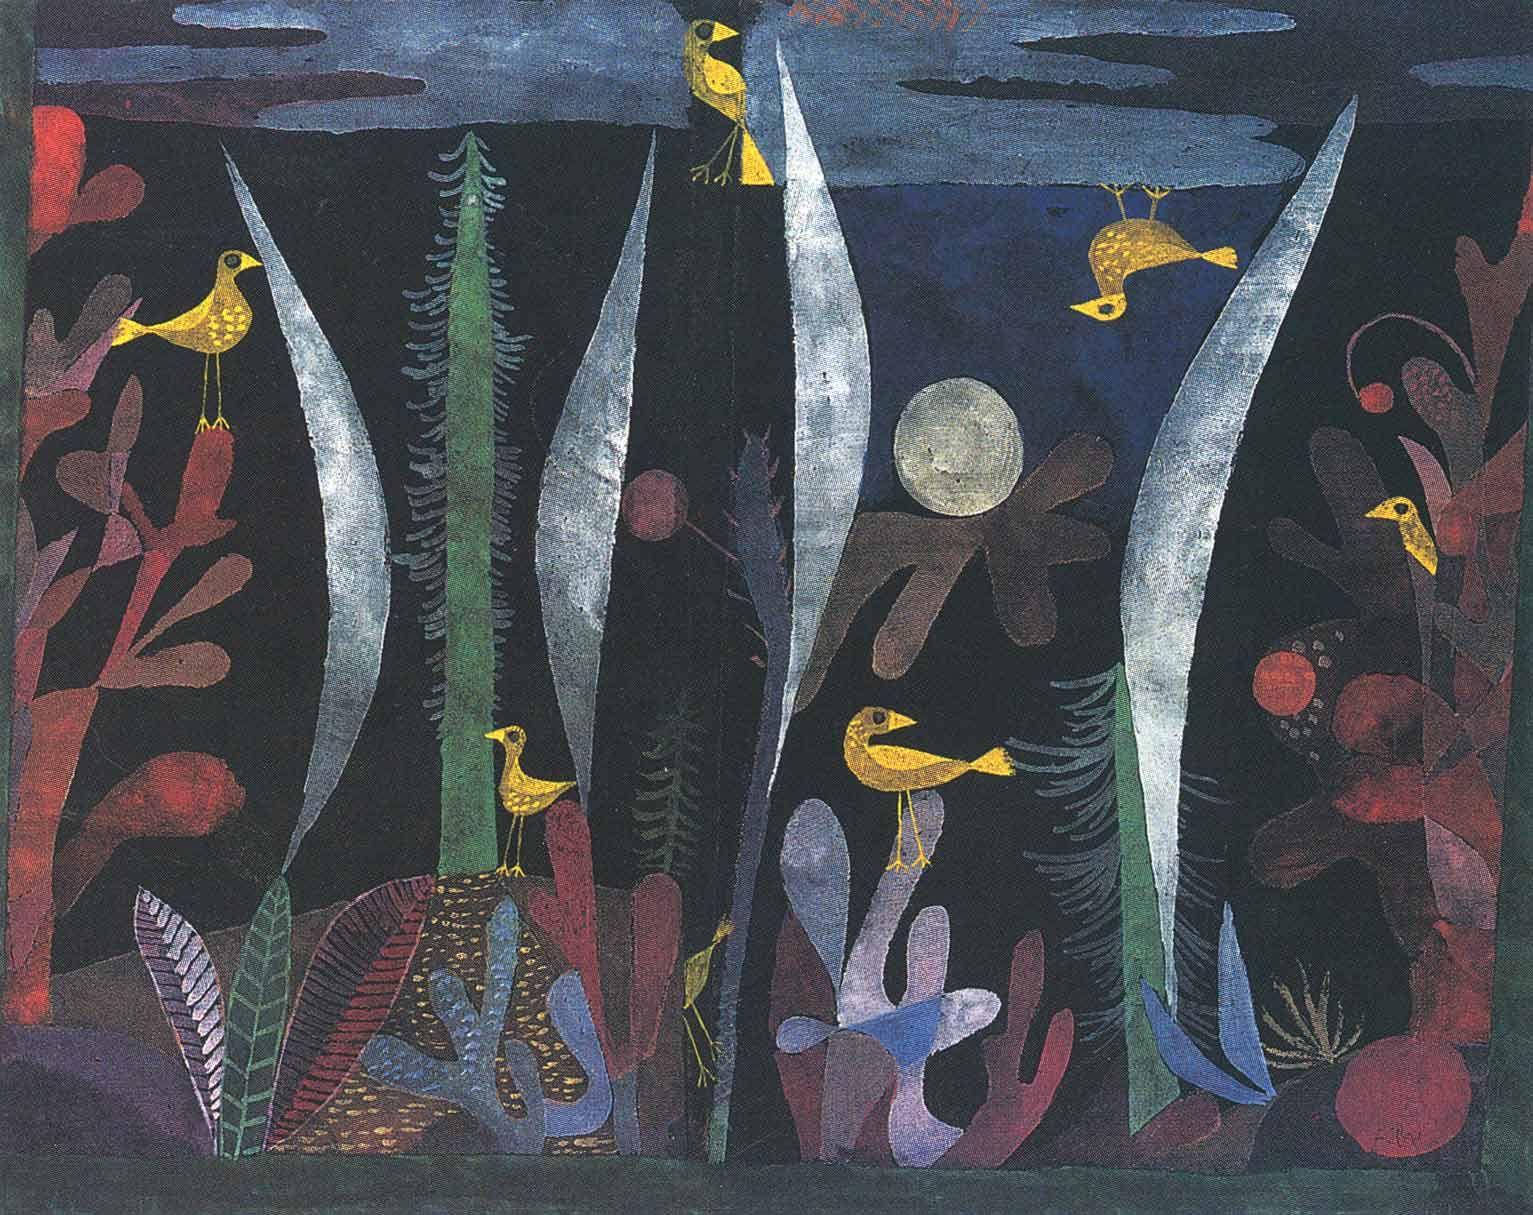 Paul Klee Arte De Passaro Passaro Amarelo Obras De Paul Klee